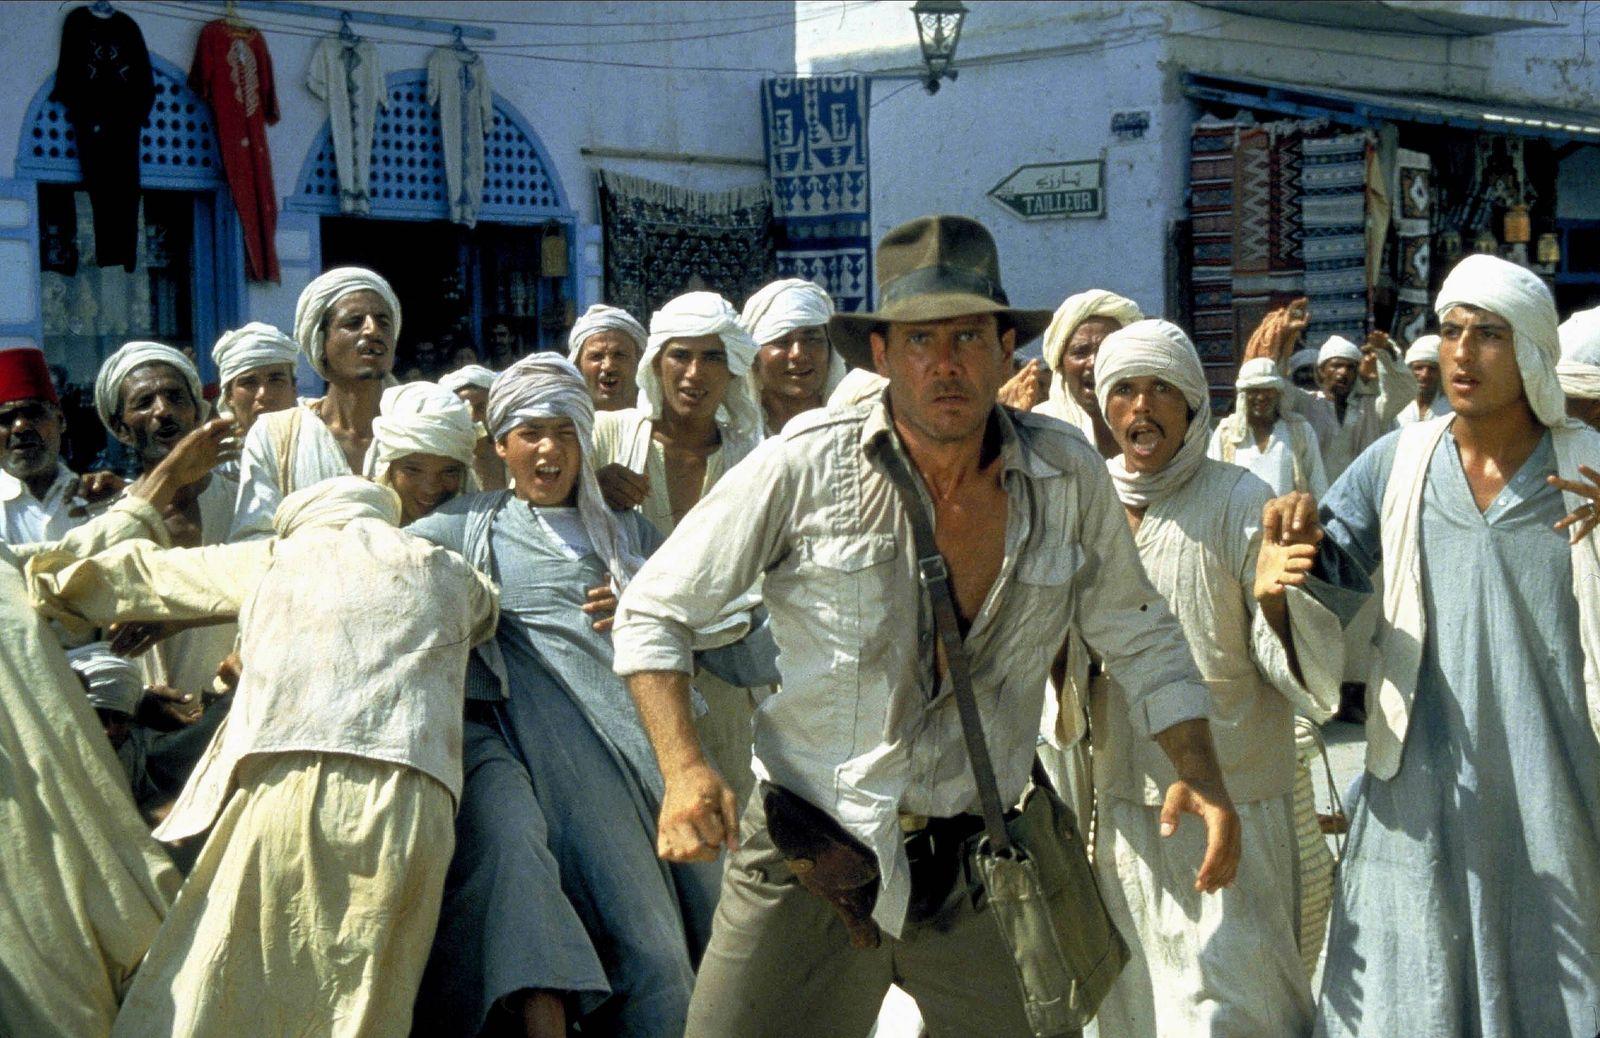 Harrison Ford Characters: Indiana Jones Film: Raiders Of The Lost Ark; Indiana Jones 1 (USA 1981) Director: Steven Spiel